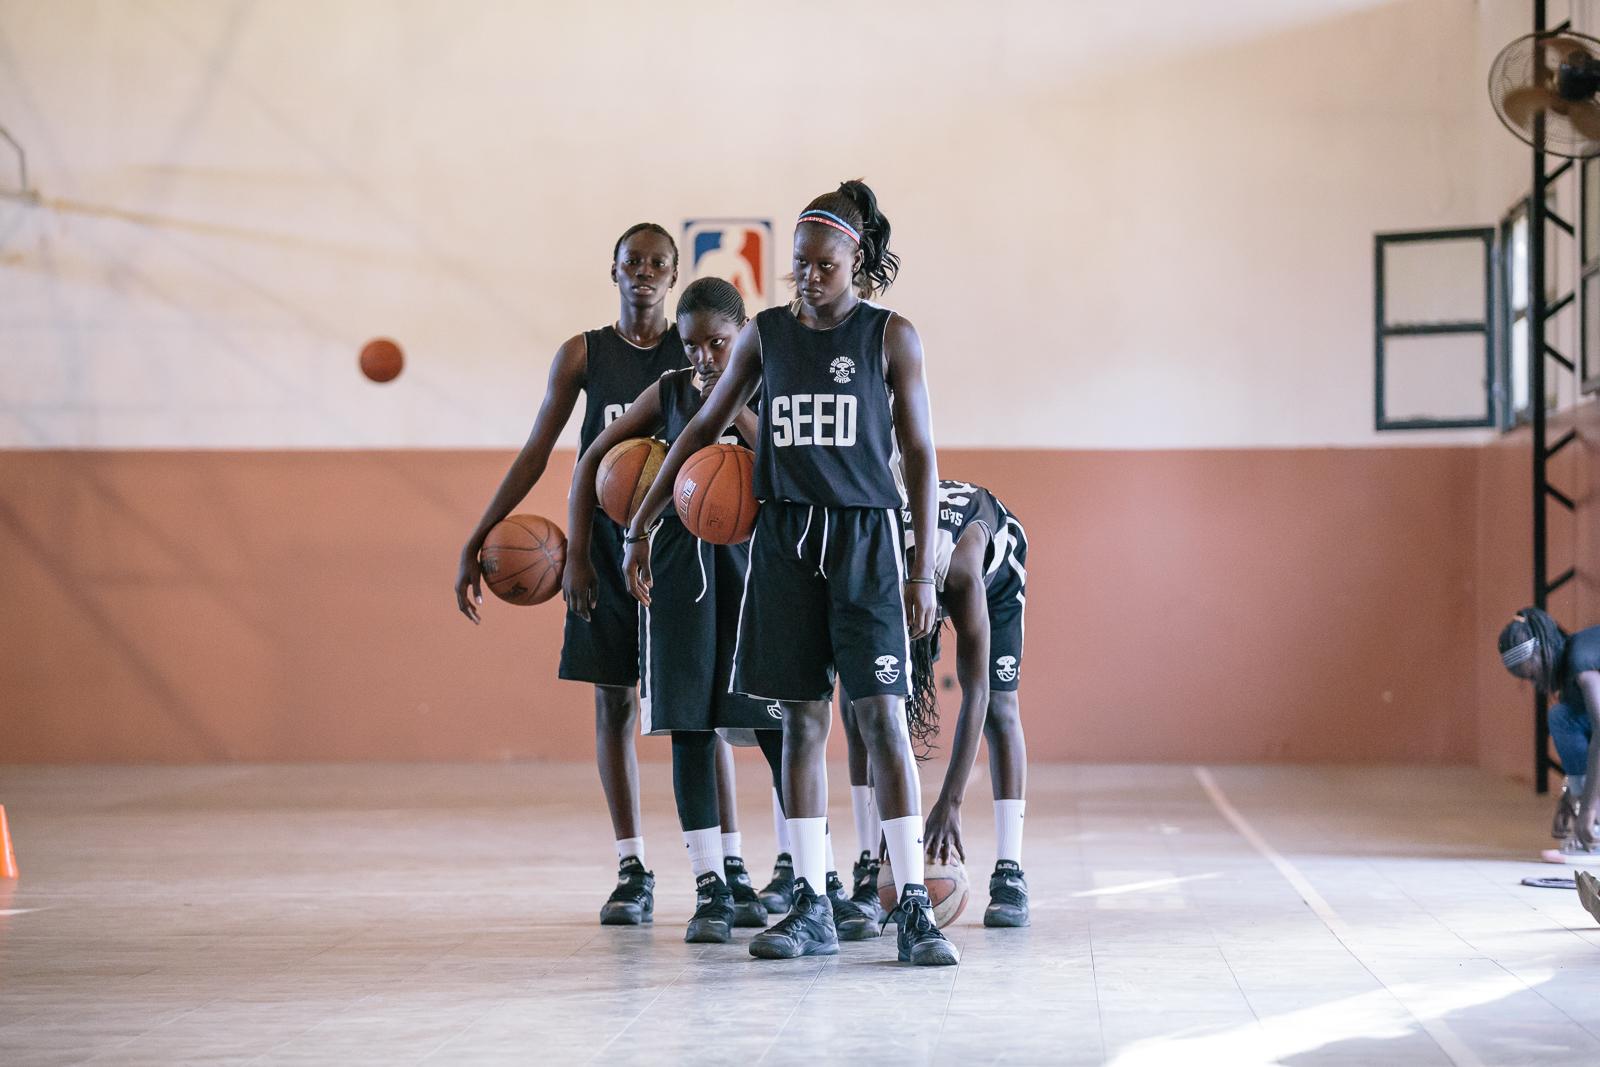 0138_20150529_Seed Academy_Thiès_Senegal©KevinCouliau.jpg